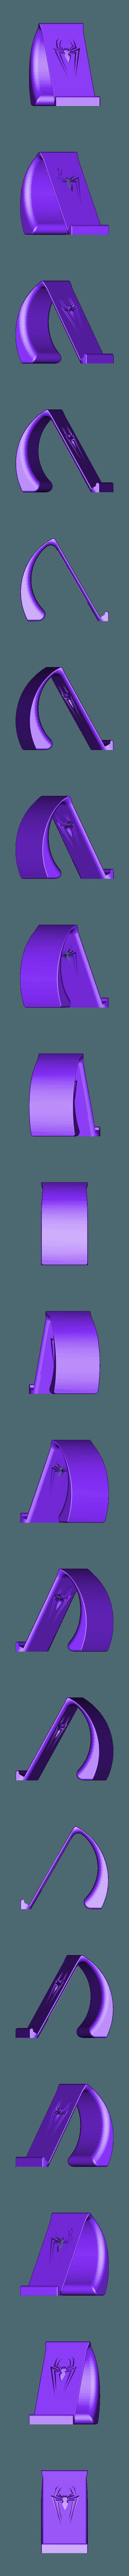 SPIDERMAN Phone Holder.STL Download STL file SPIDERMAN Phone Holder • 3D printer template, IceKiwi